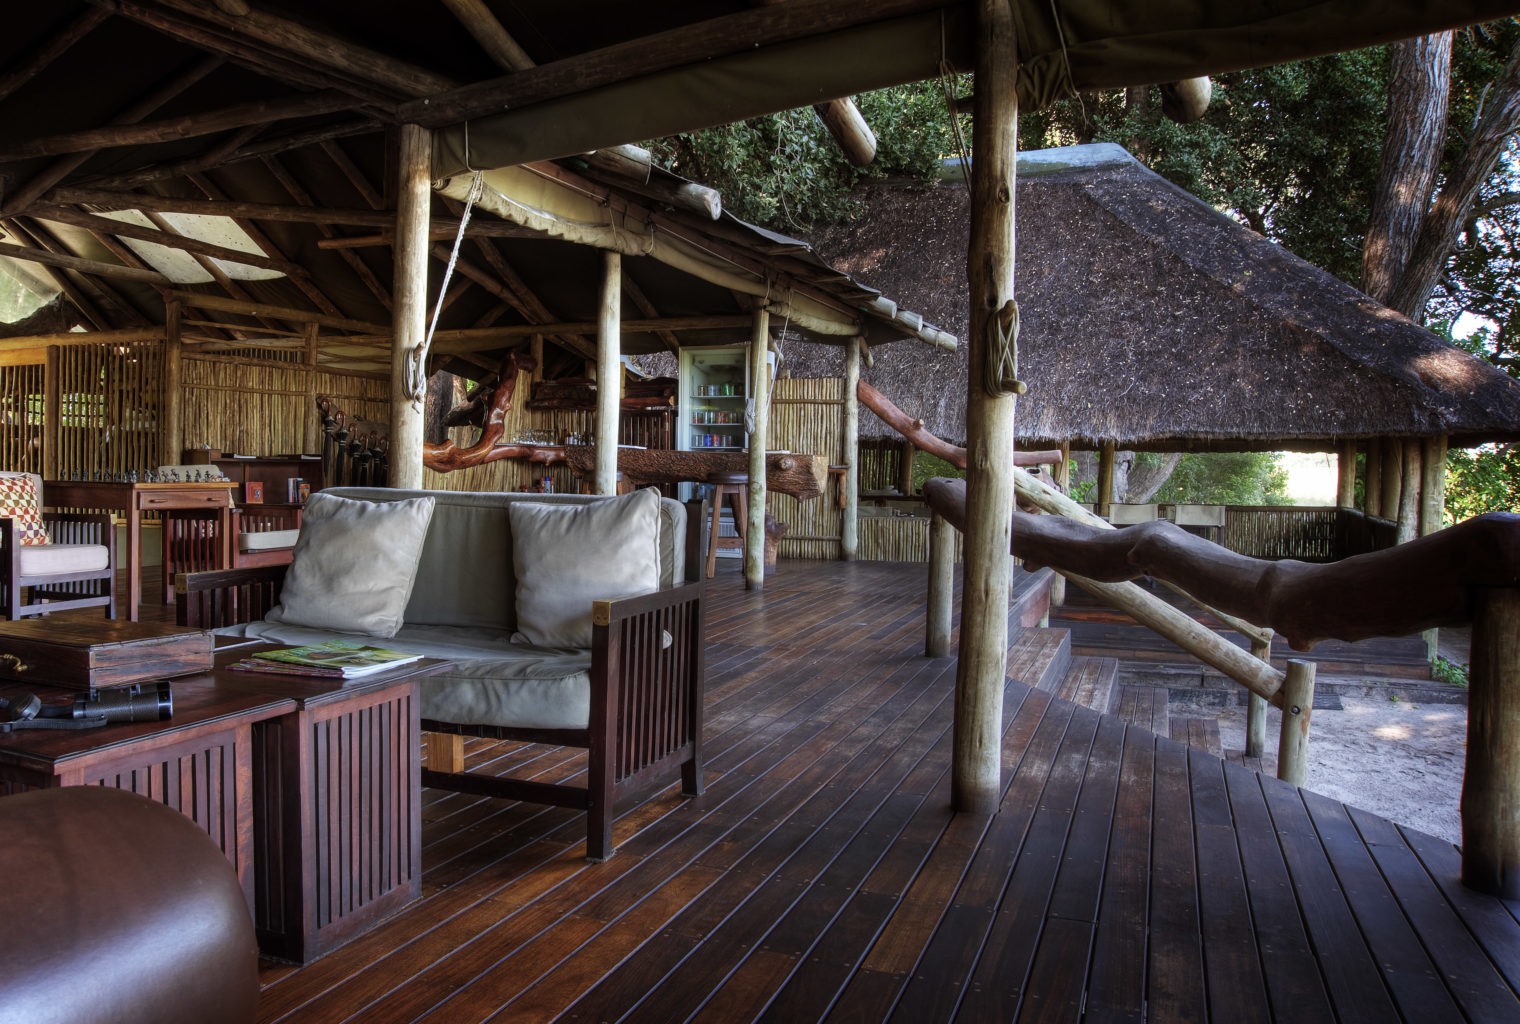 Kwara-Camp-Botswana-Main area